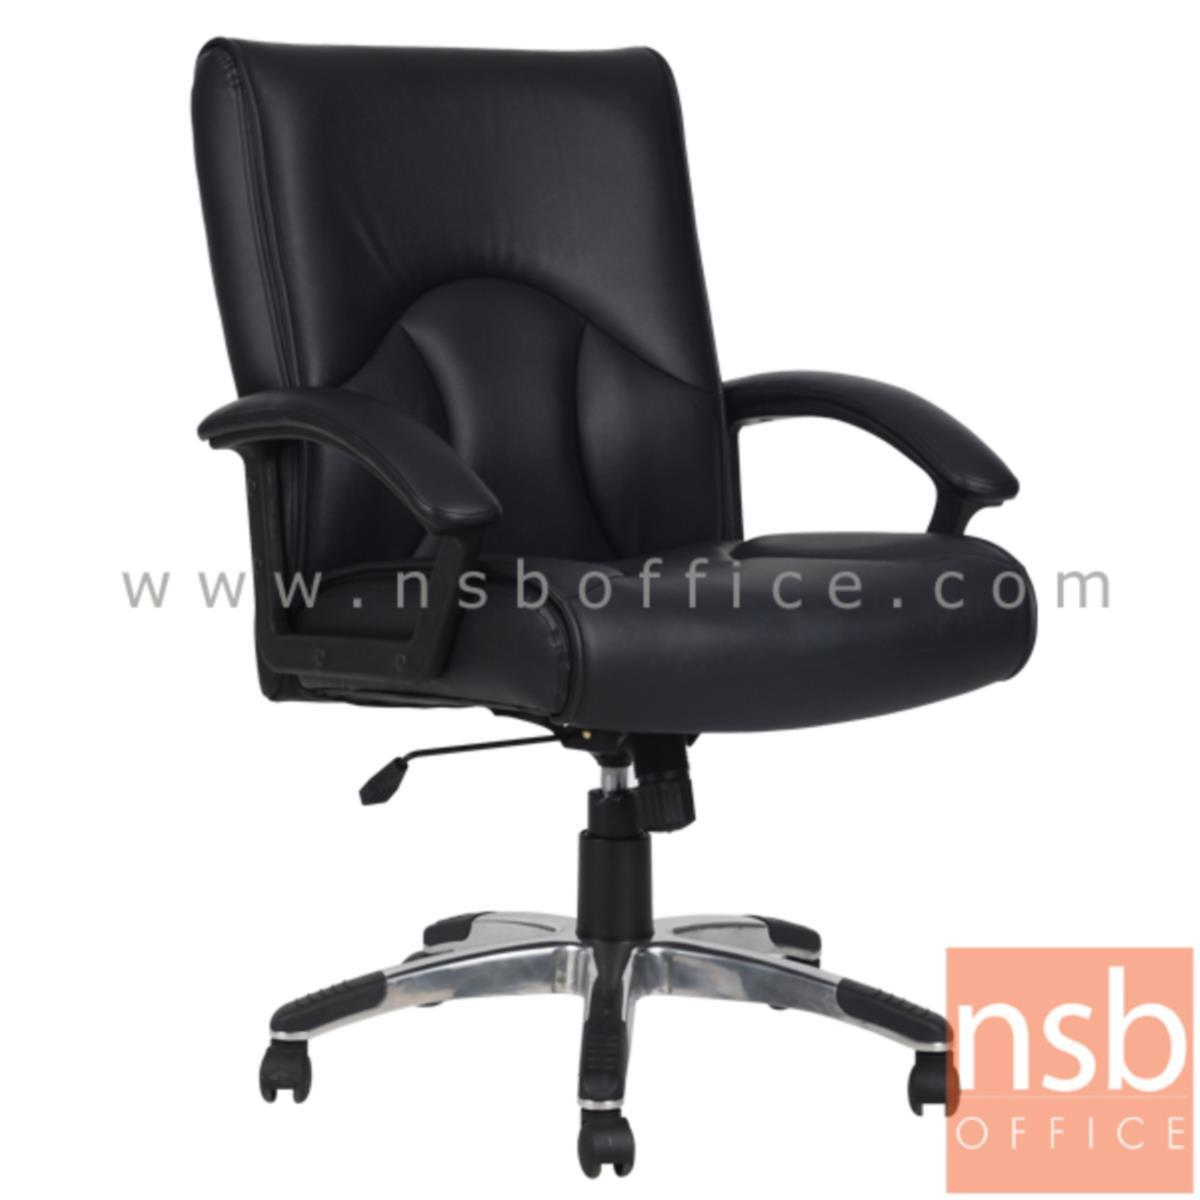 B03A294:เก้าอี้สำนักงาน รุ่น YT-2CEL  โช๊คแก๊ส มีก้อนโยก ขาอลูมินั่มอัลลอย